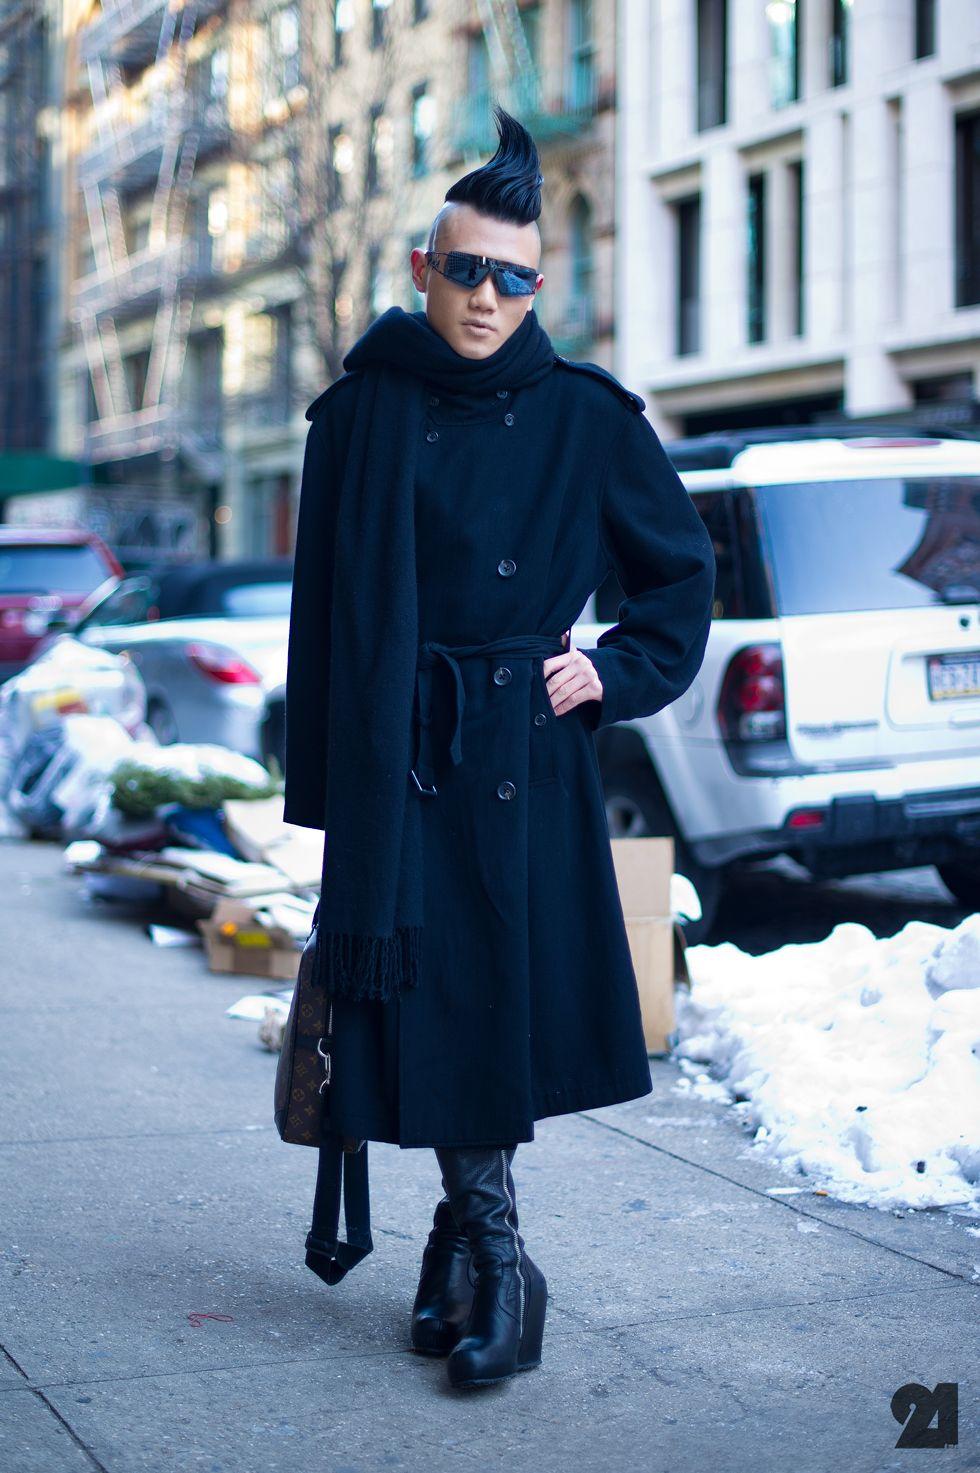 New York City Street Fashion | New York City Street Style